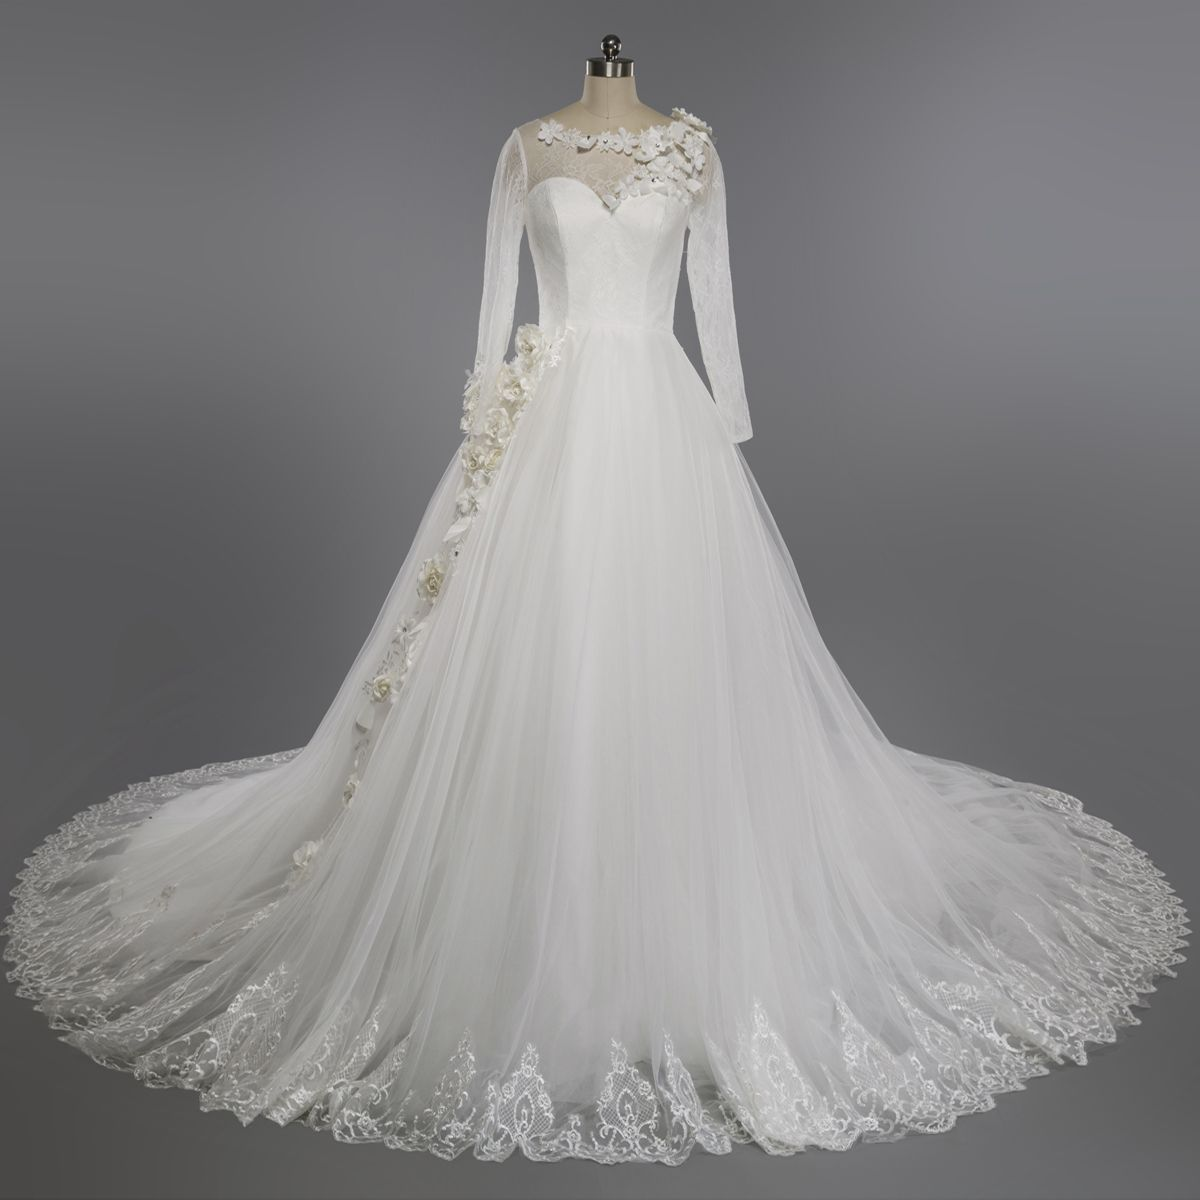 Wedding dressvintage wedding dressesmuslim wedding dresslong